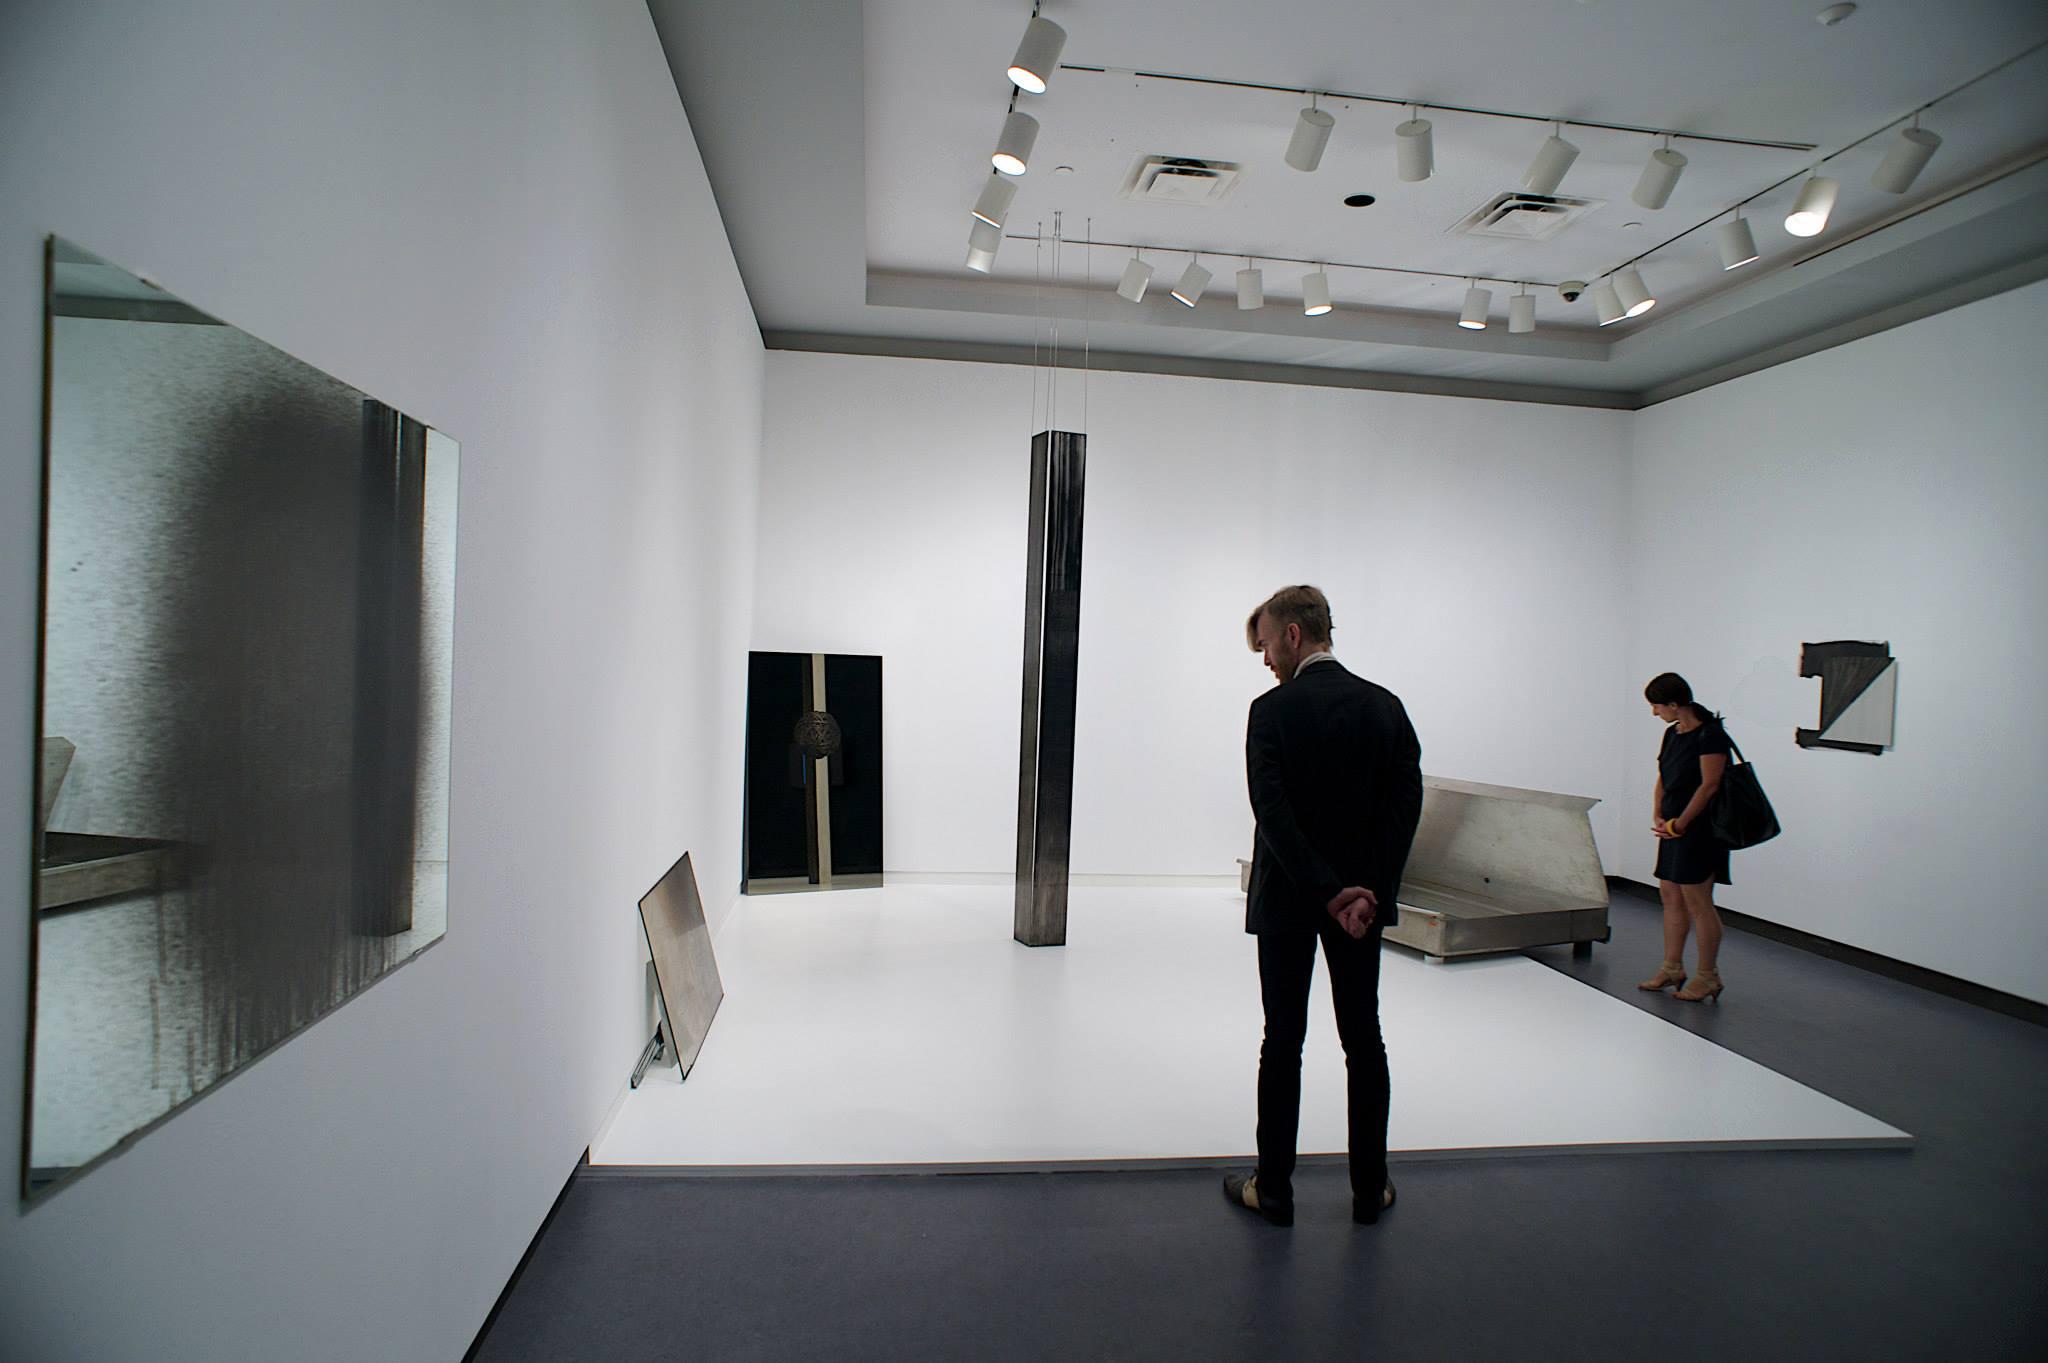 Close Listening, detail: Jinny Yu, 2014, installation view, Ottawa Art Gallery, Ontario, Canada. Photo: David Barbour